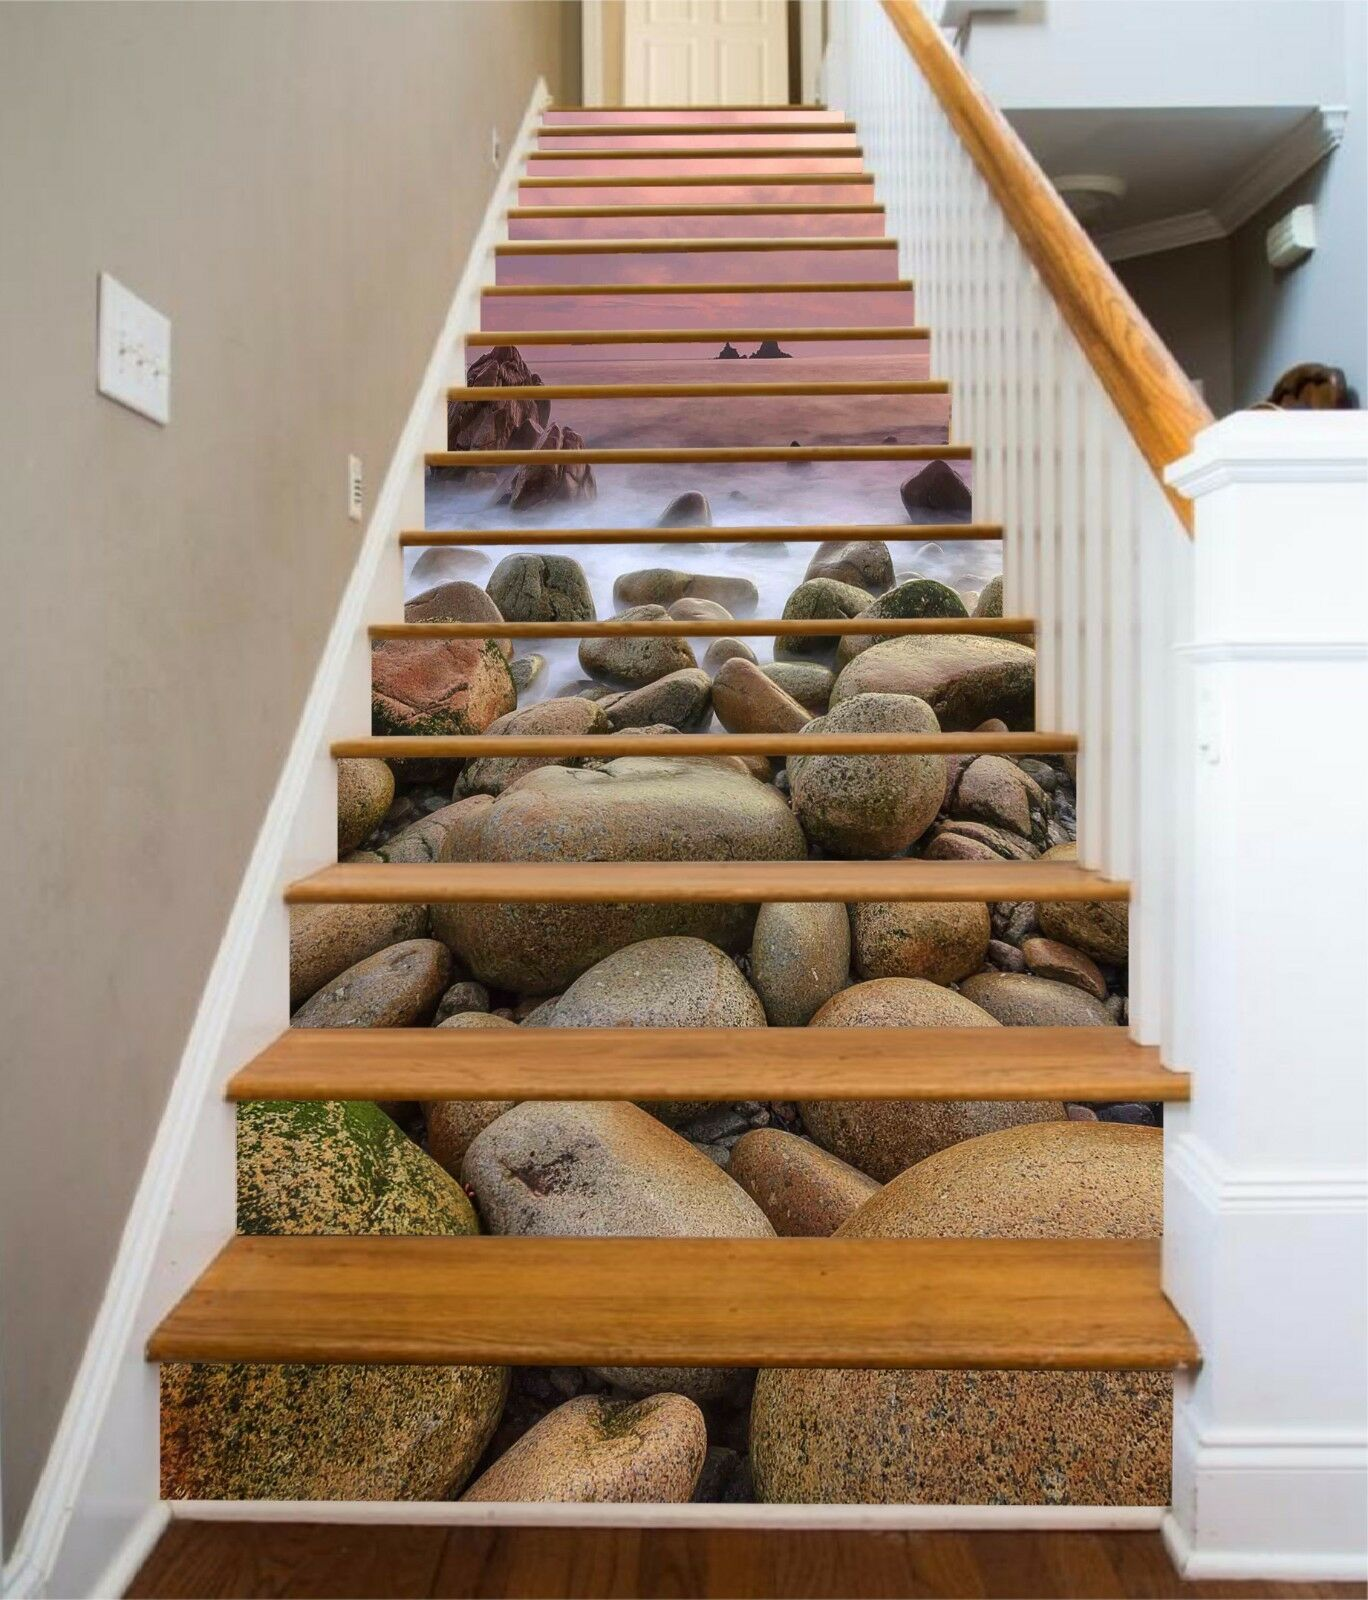 3D Seaside Stones 6 Stair Risers Decoration Photo Mural Vinyl Decal Wallpaper AU